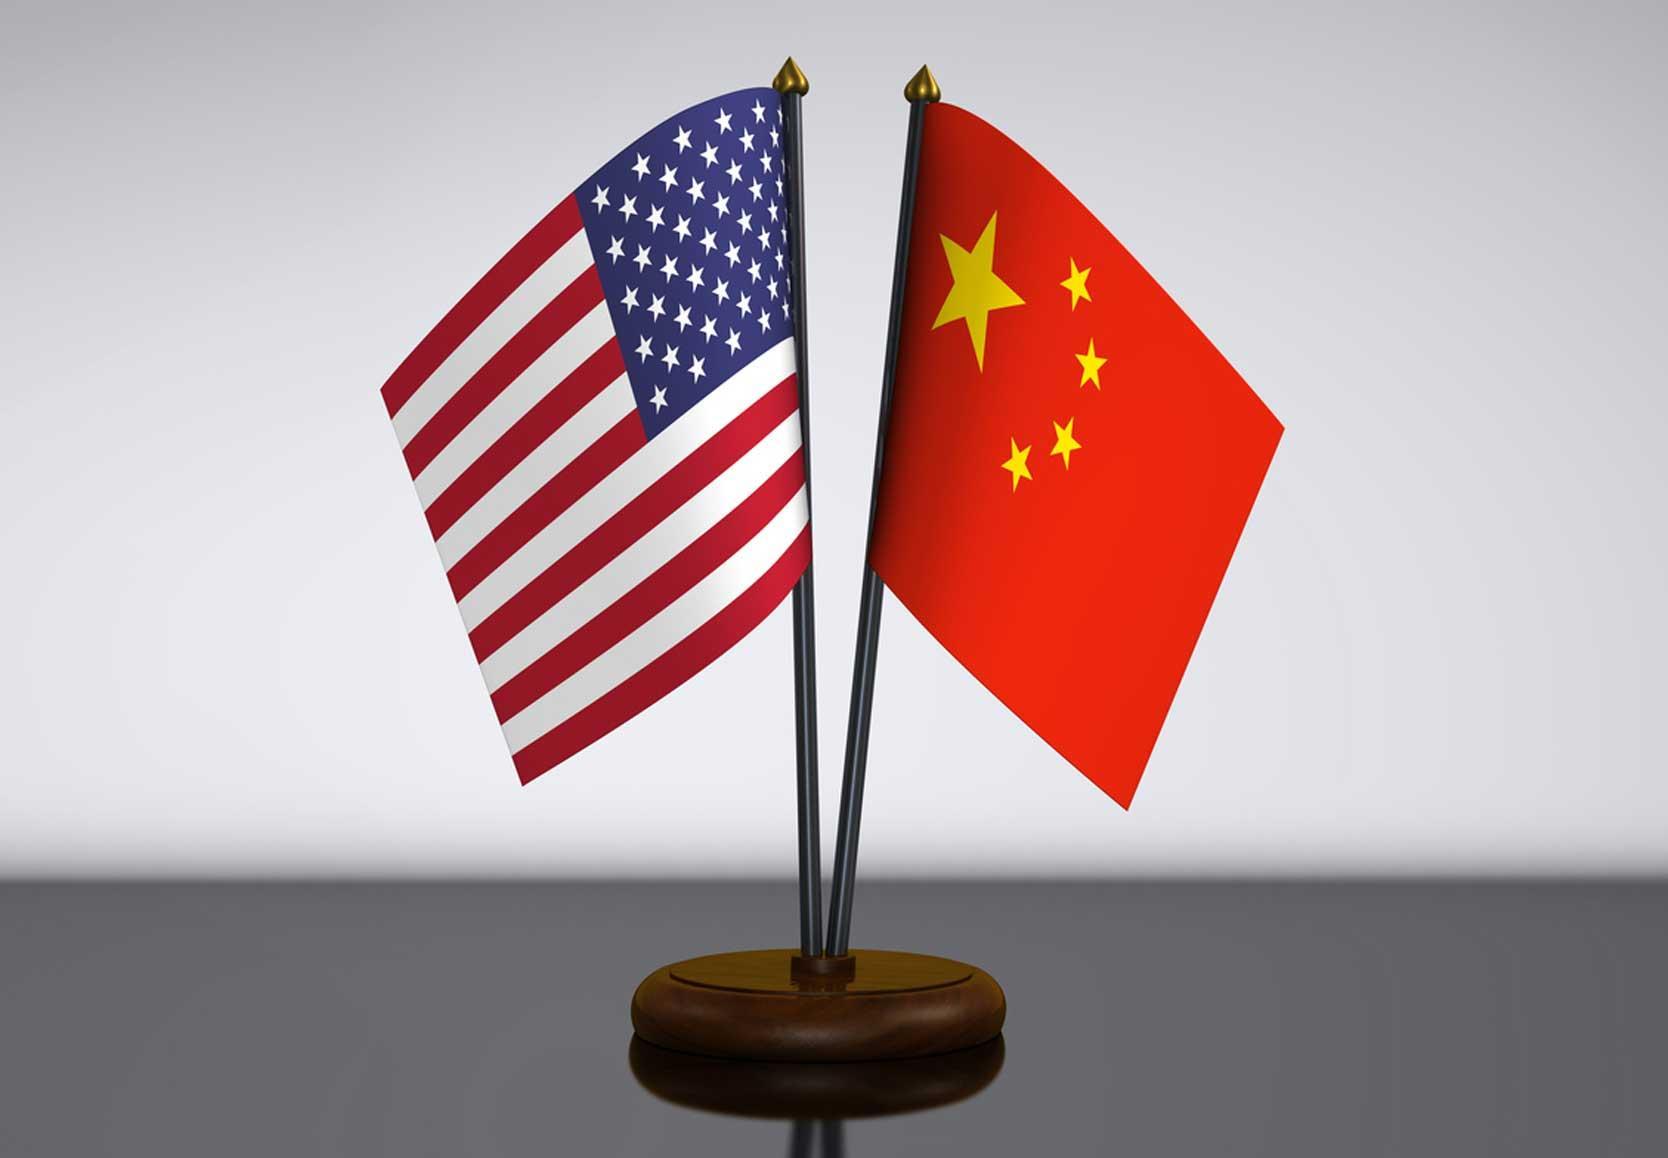 China vows reciprocal retaliation in response to latest US tariffs: MOFCOM